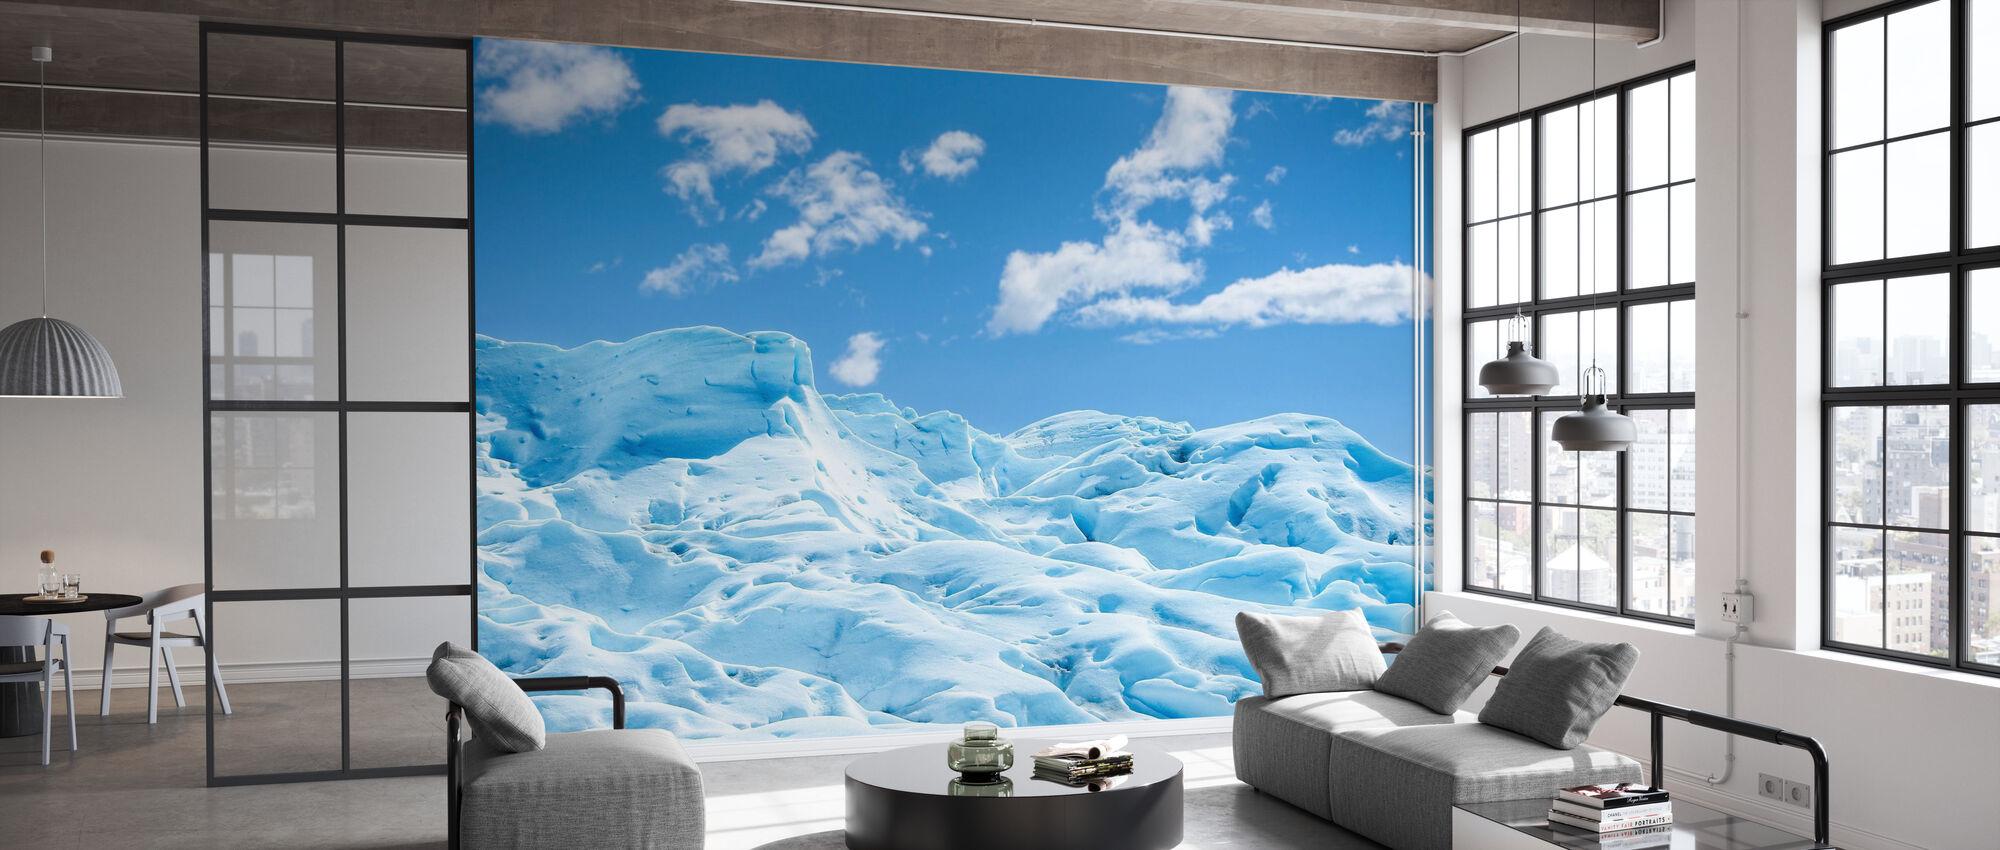 Frozen Ground - Wallpaper - Office